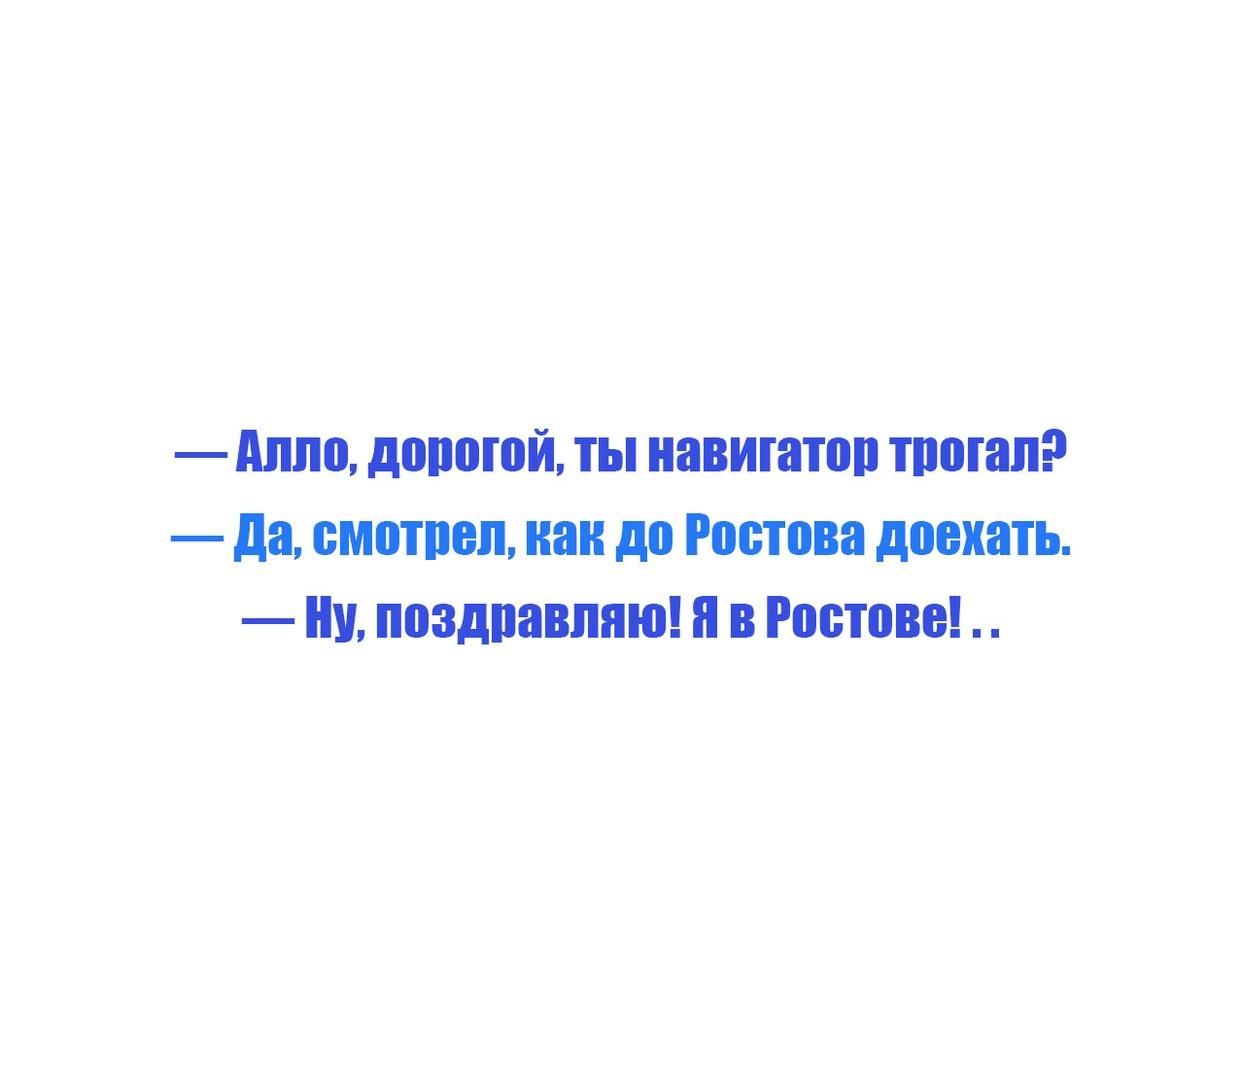 IiWjiFLv6lU.jpg